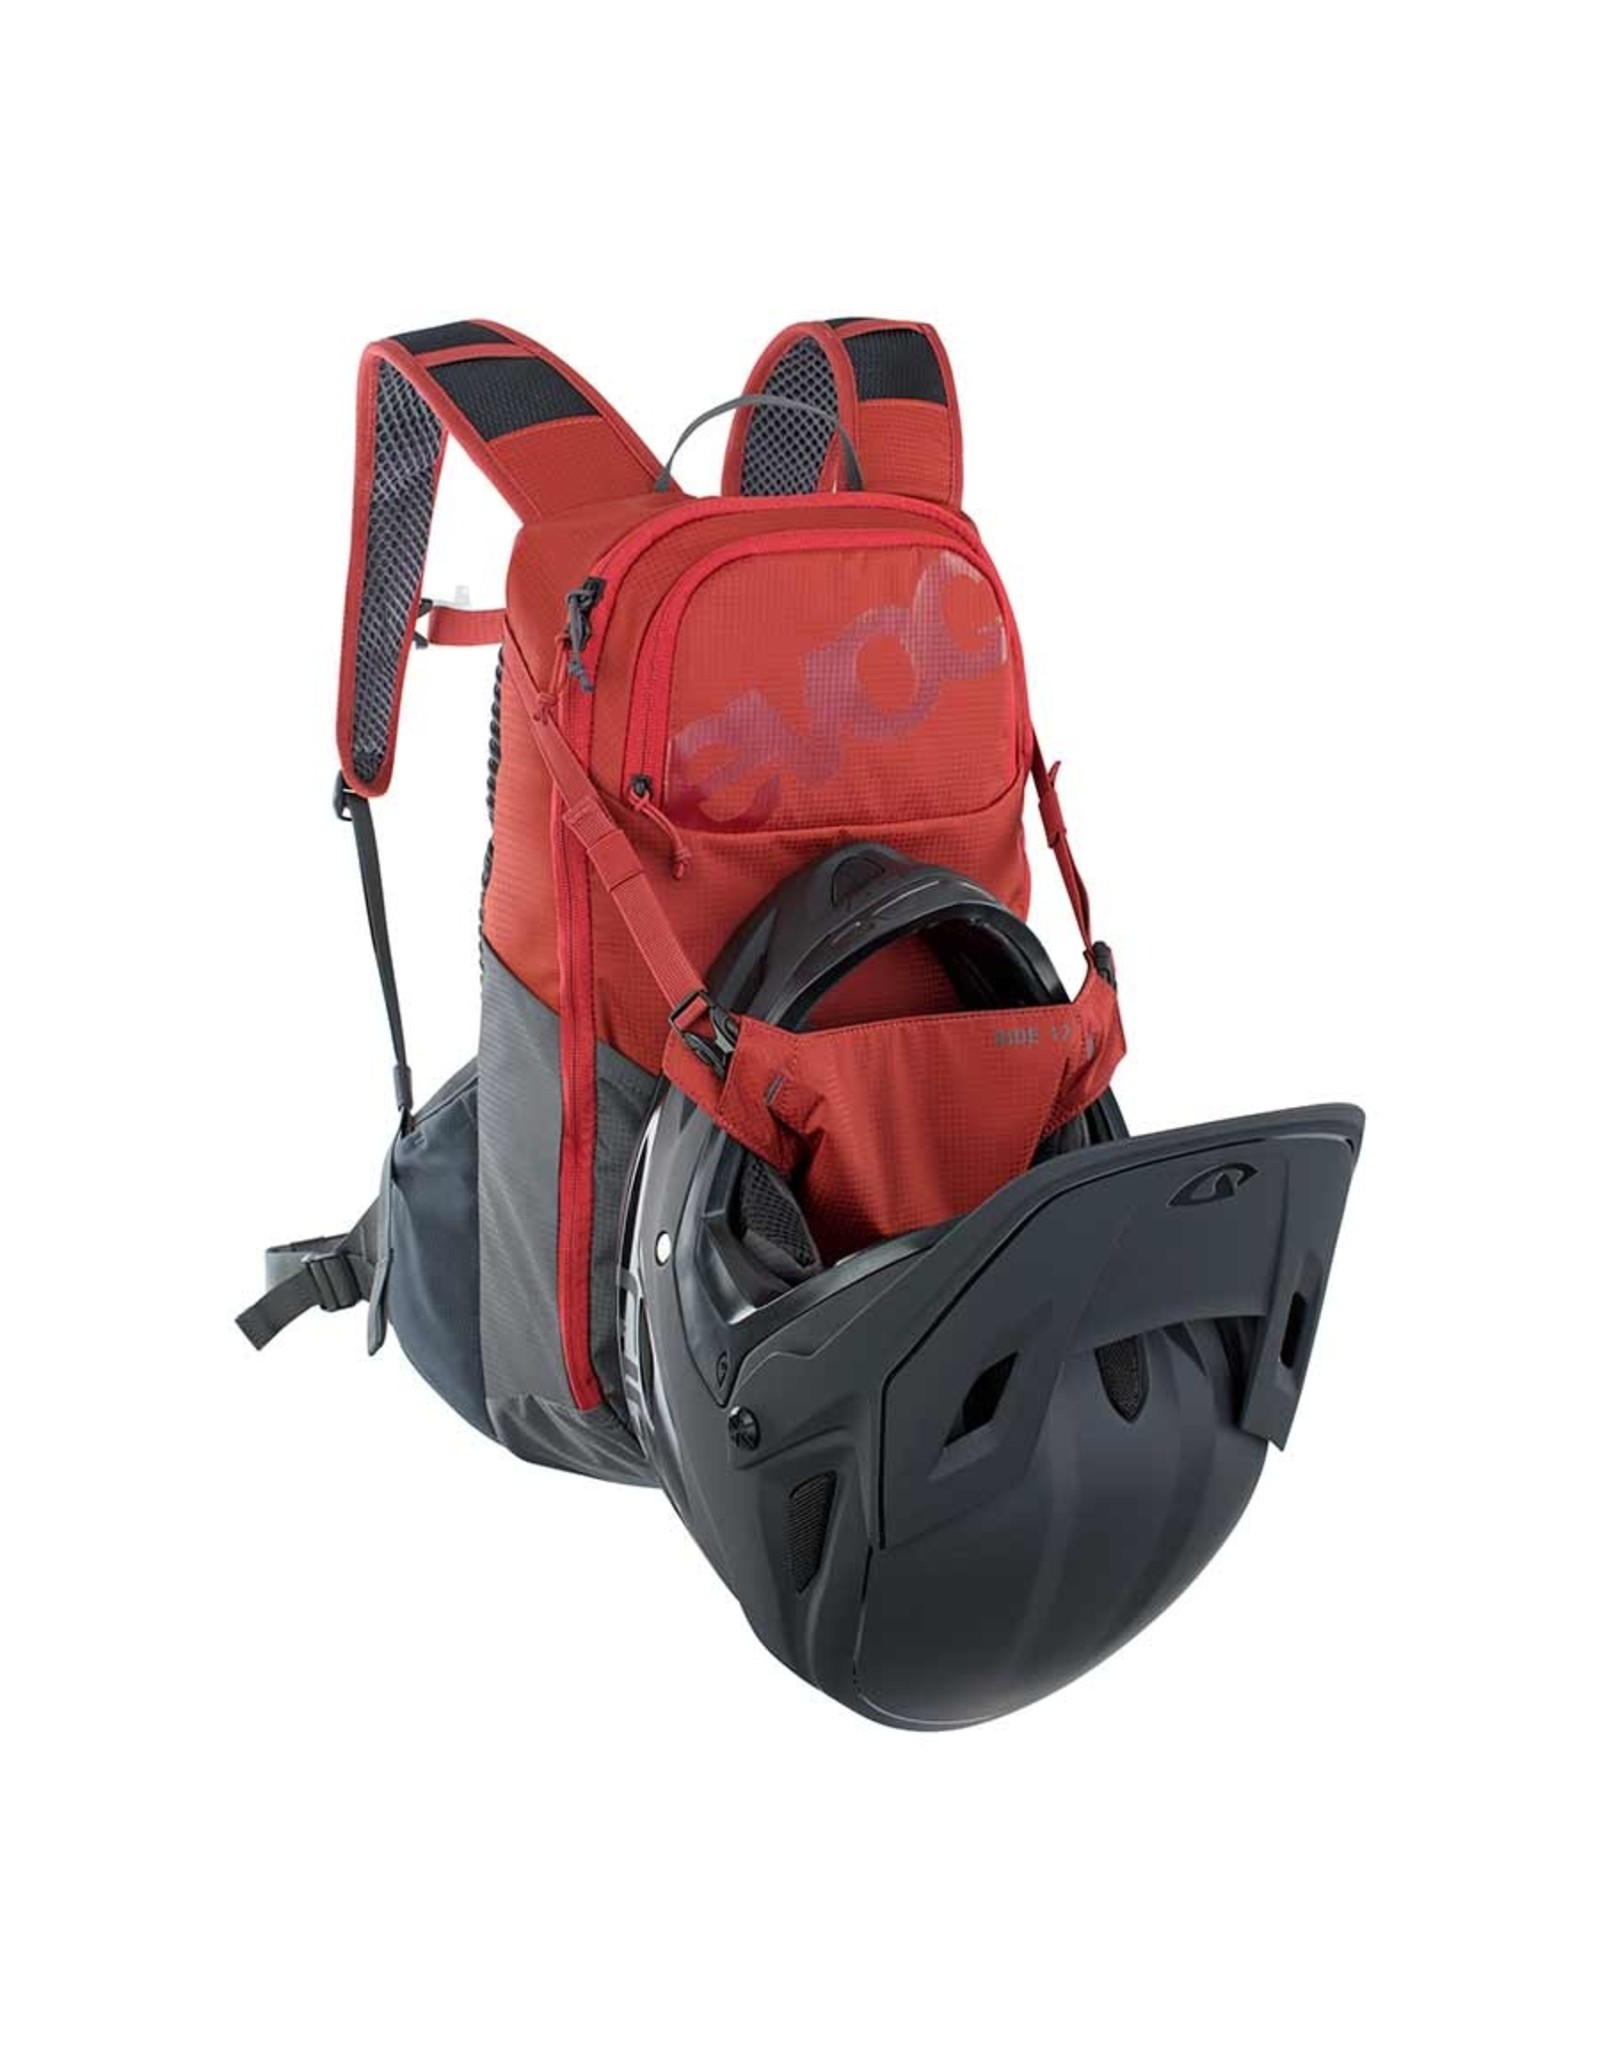 EVOC EVOC, Ride 12 Hydration Bag, 12L, bladder not inc., Chili Red/Carbon Grey